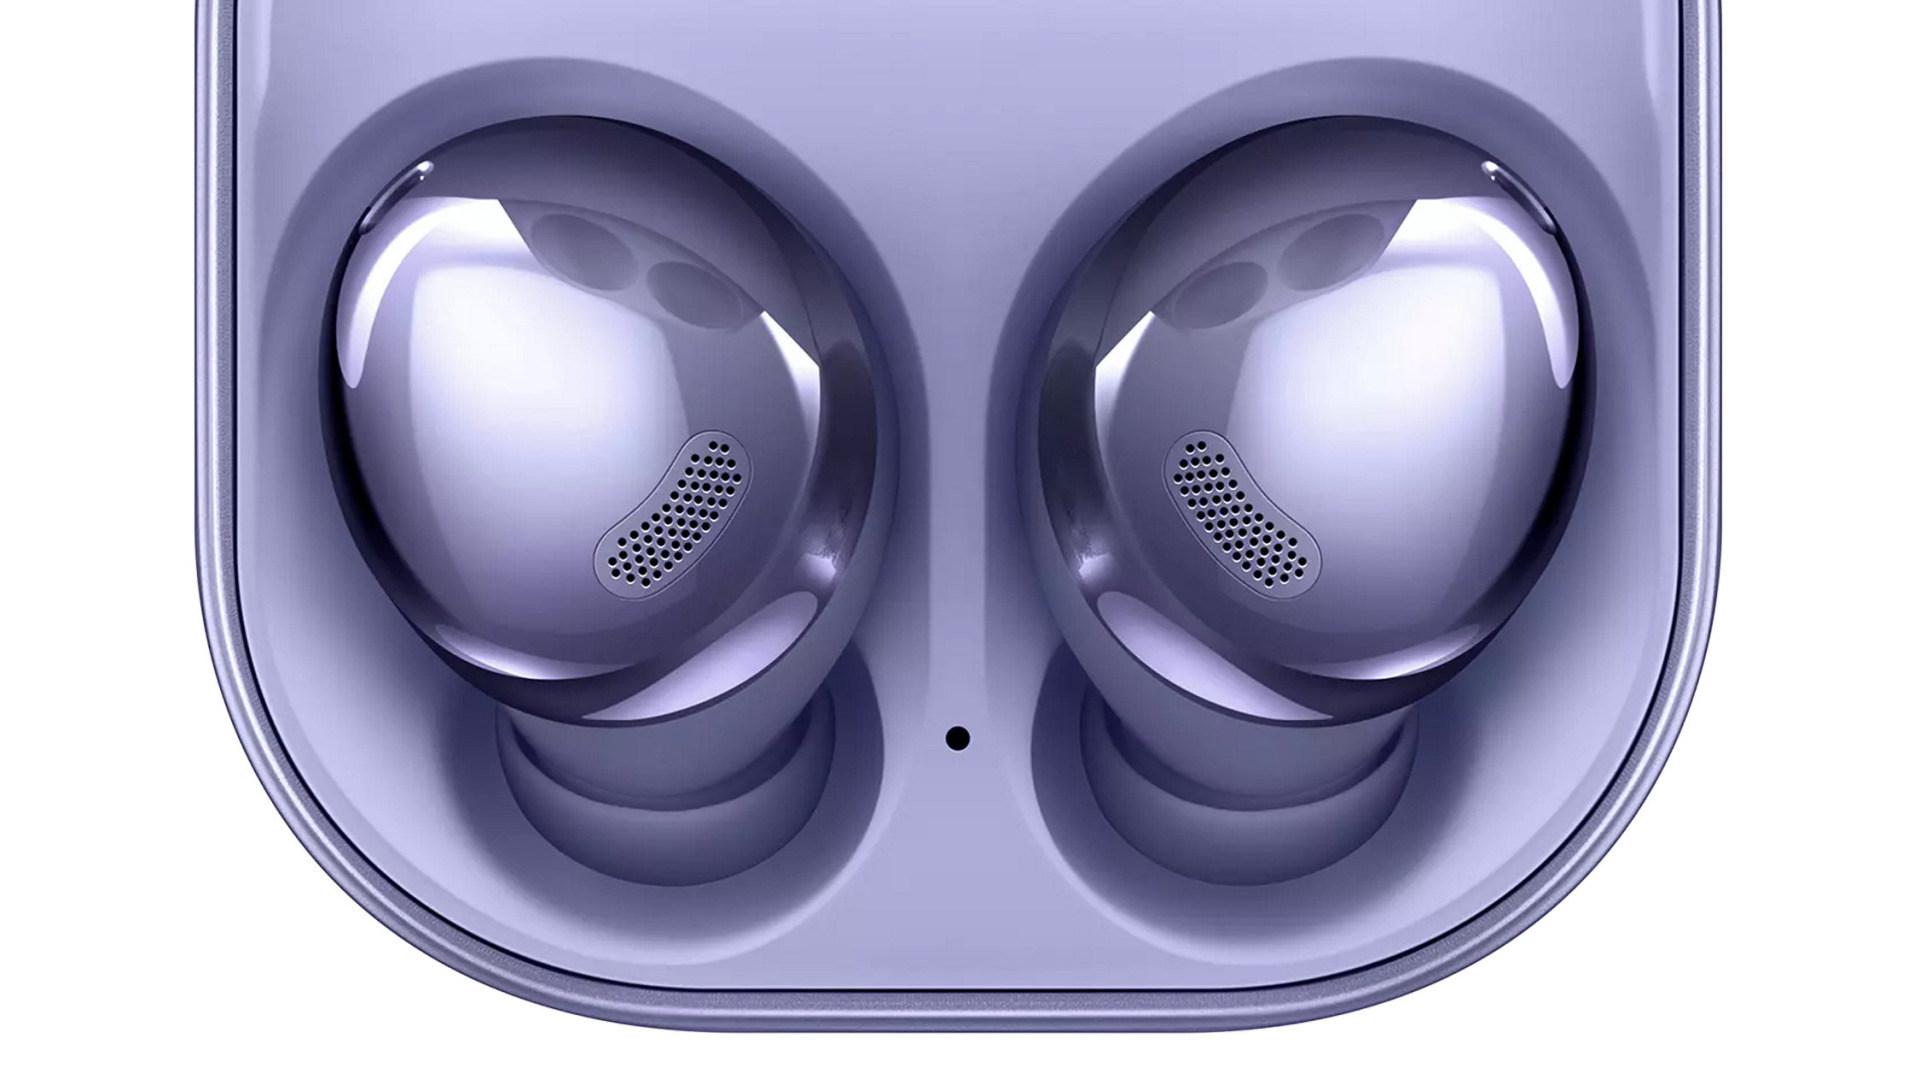 Samsung, Kopfhörer, Bluetooth, Earbuds, Samsung Galaxy Buds Pro, TWS